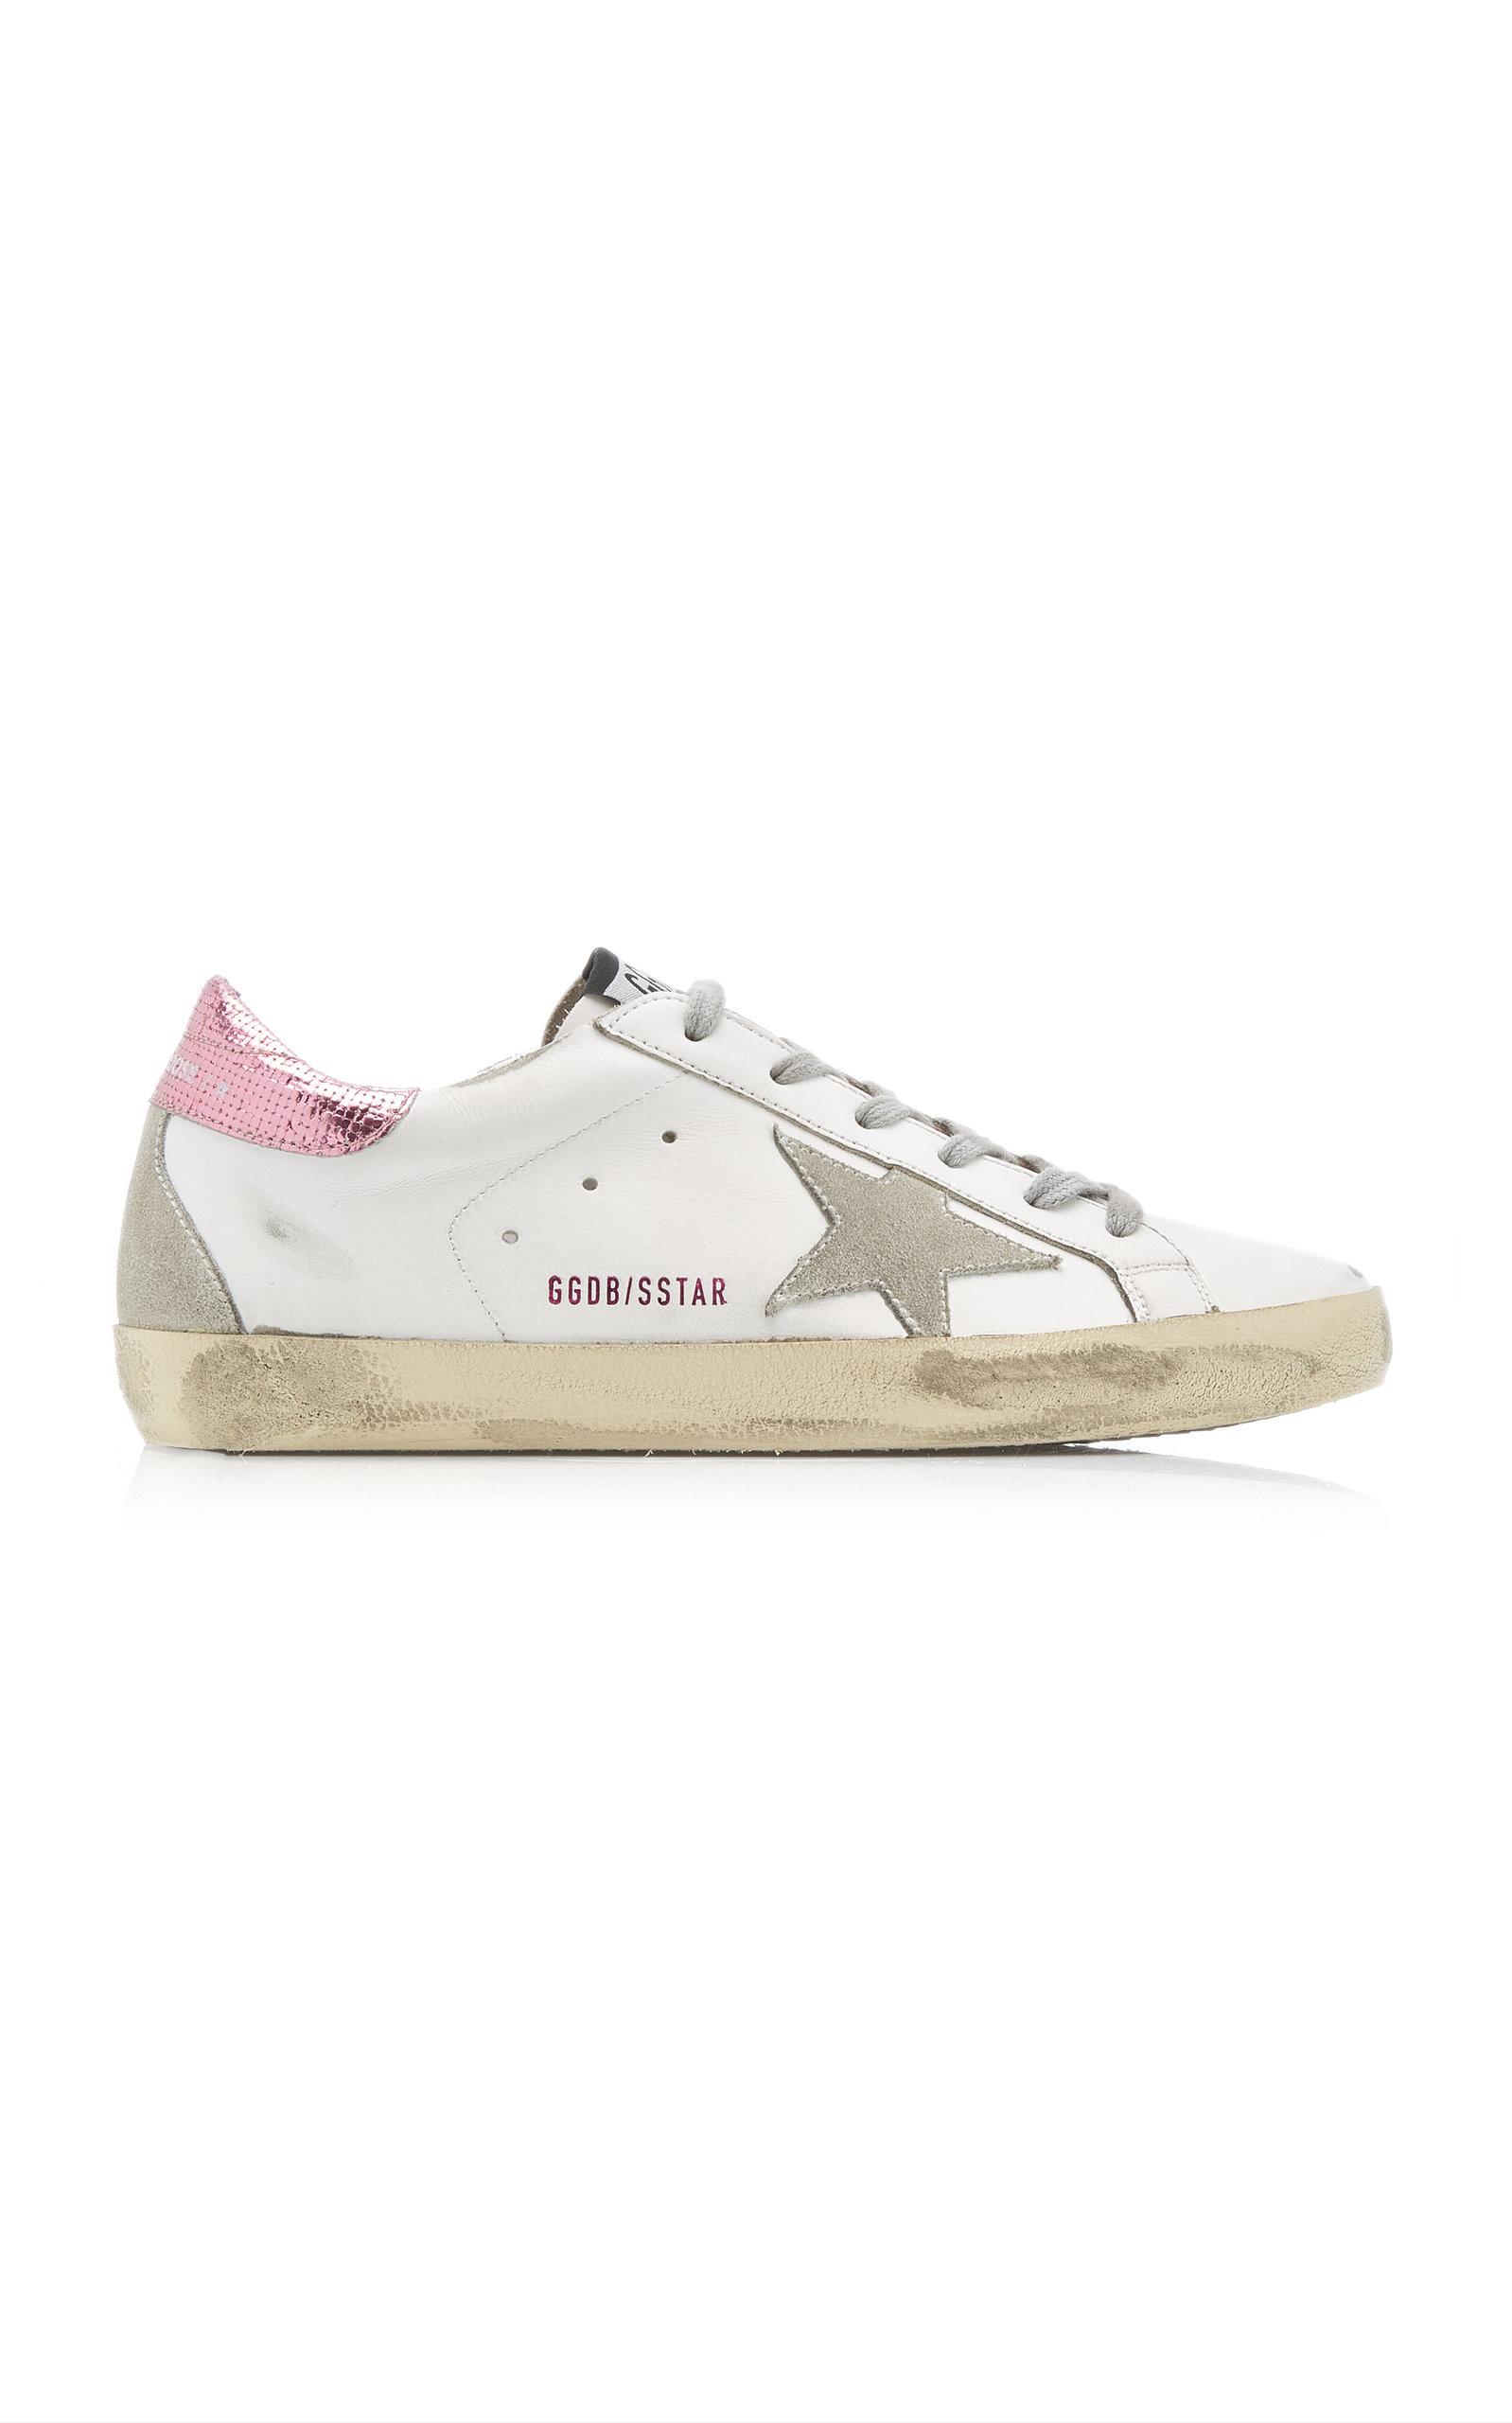 Golden Goose - Women's Superstar Low-Top Leather Sneakers  - White - Moda Operandi